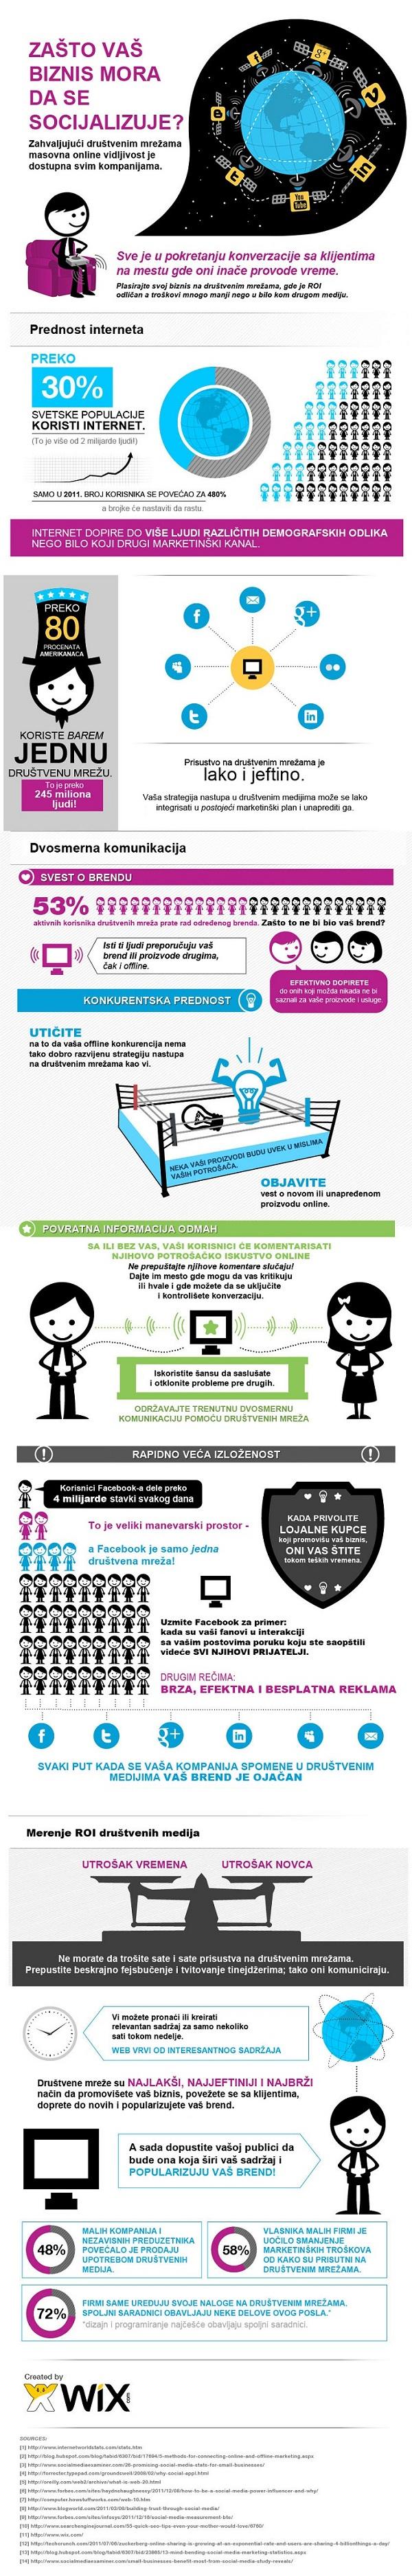 društveni mediji infografik